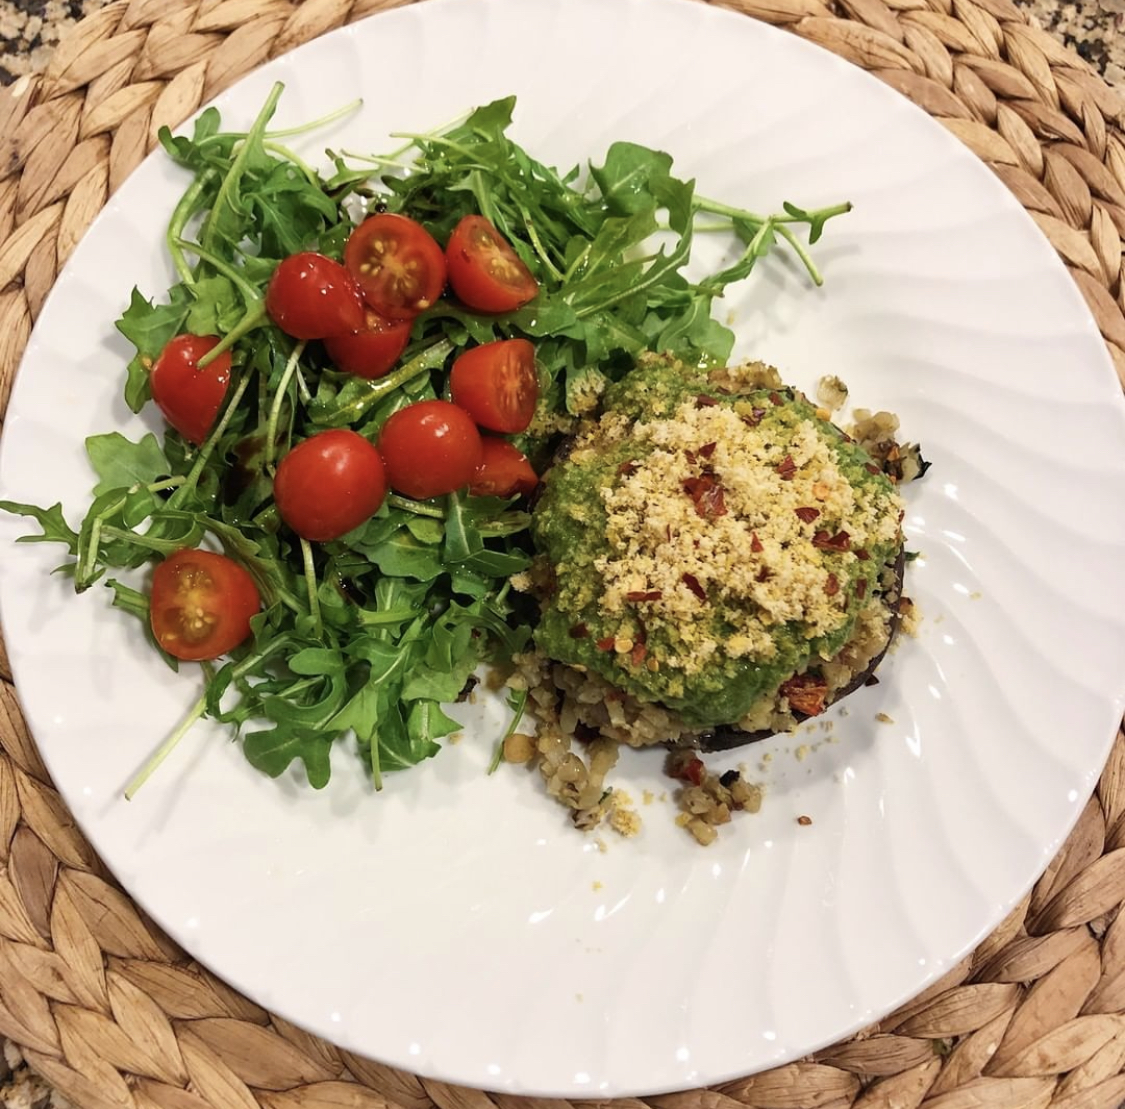 Easy healthy recipe. Weeknight meal idea. Easy meal idea.